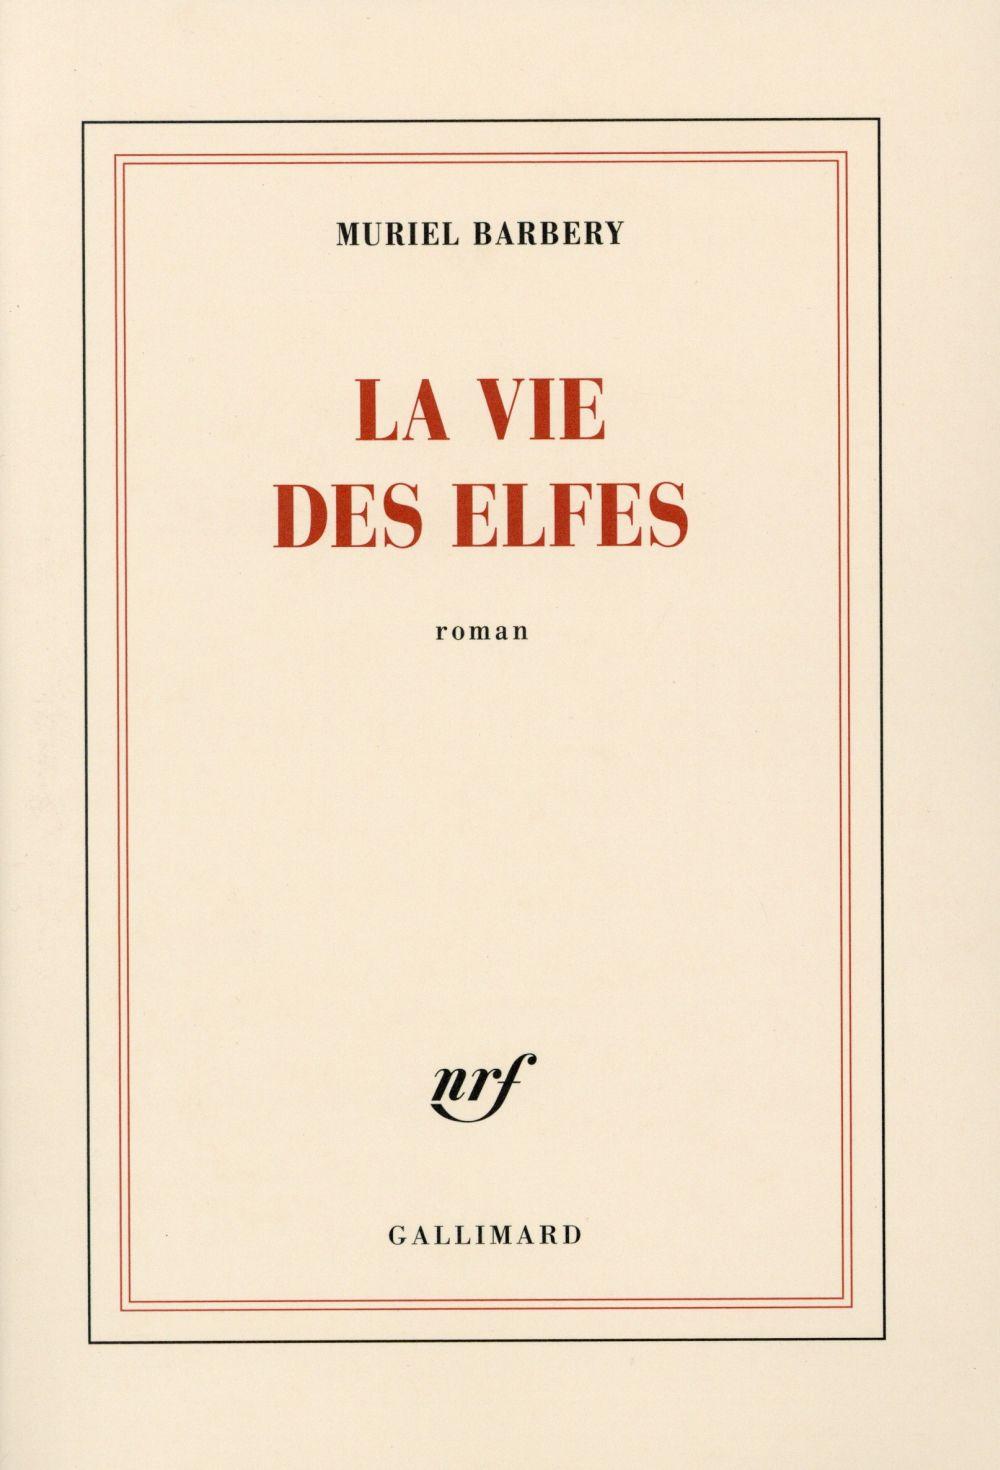 la vie des elfes / Muriel Barbery | Barbery, Muriel (1969-....)